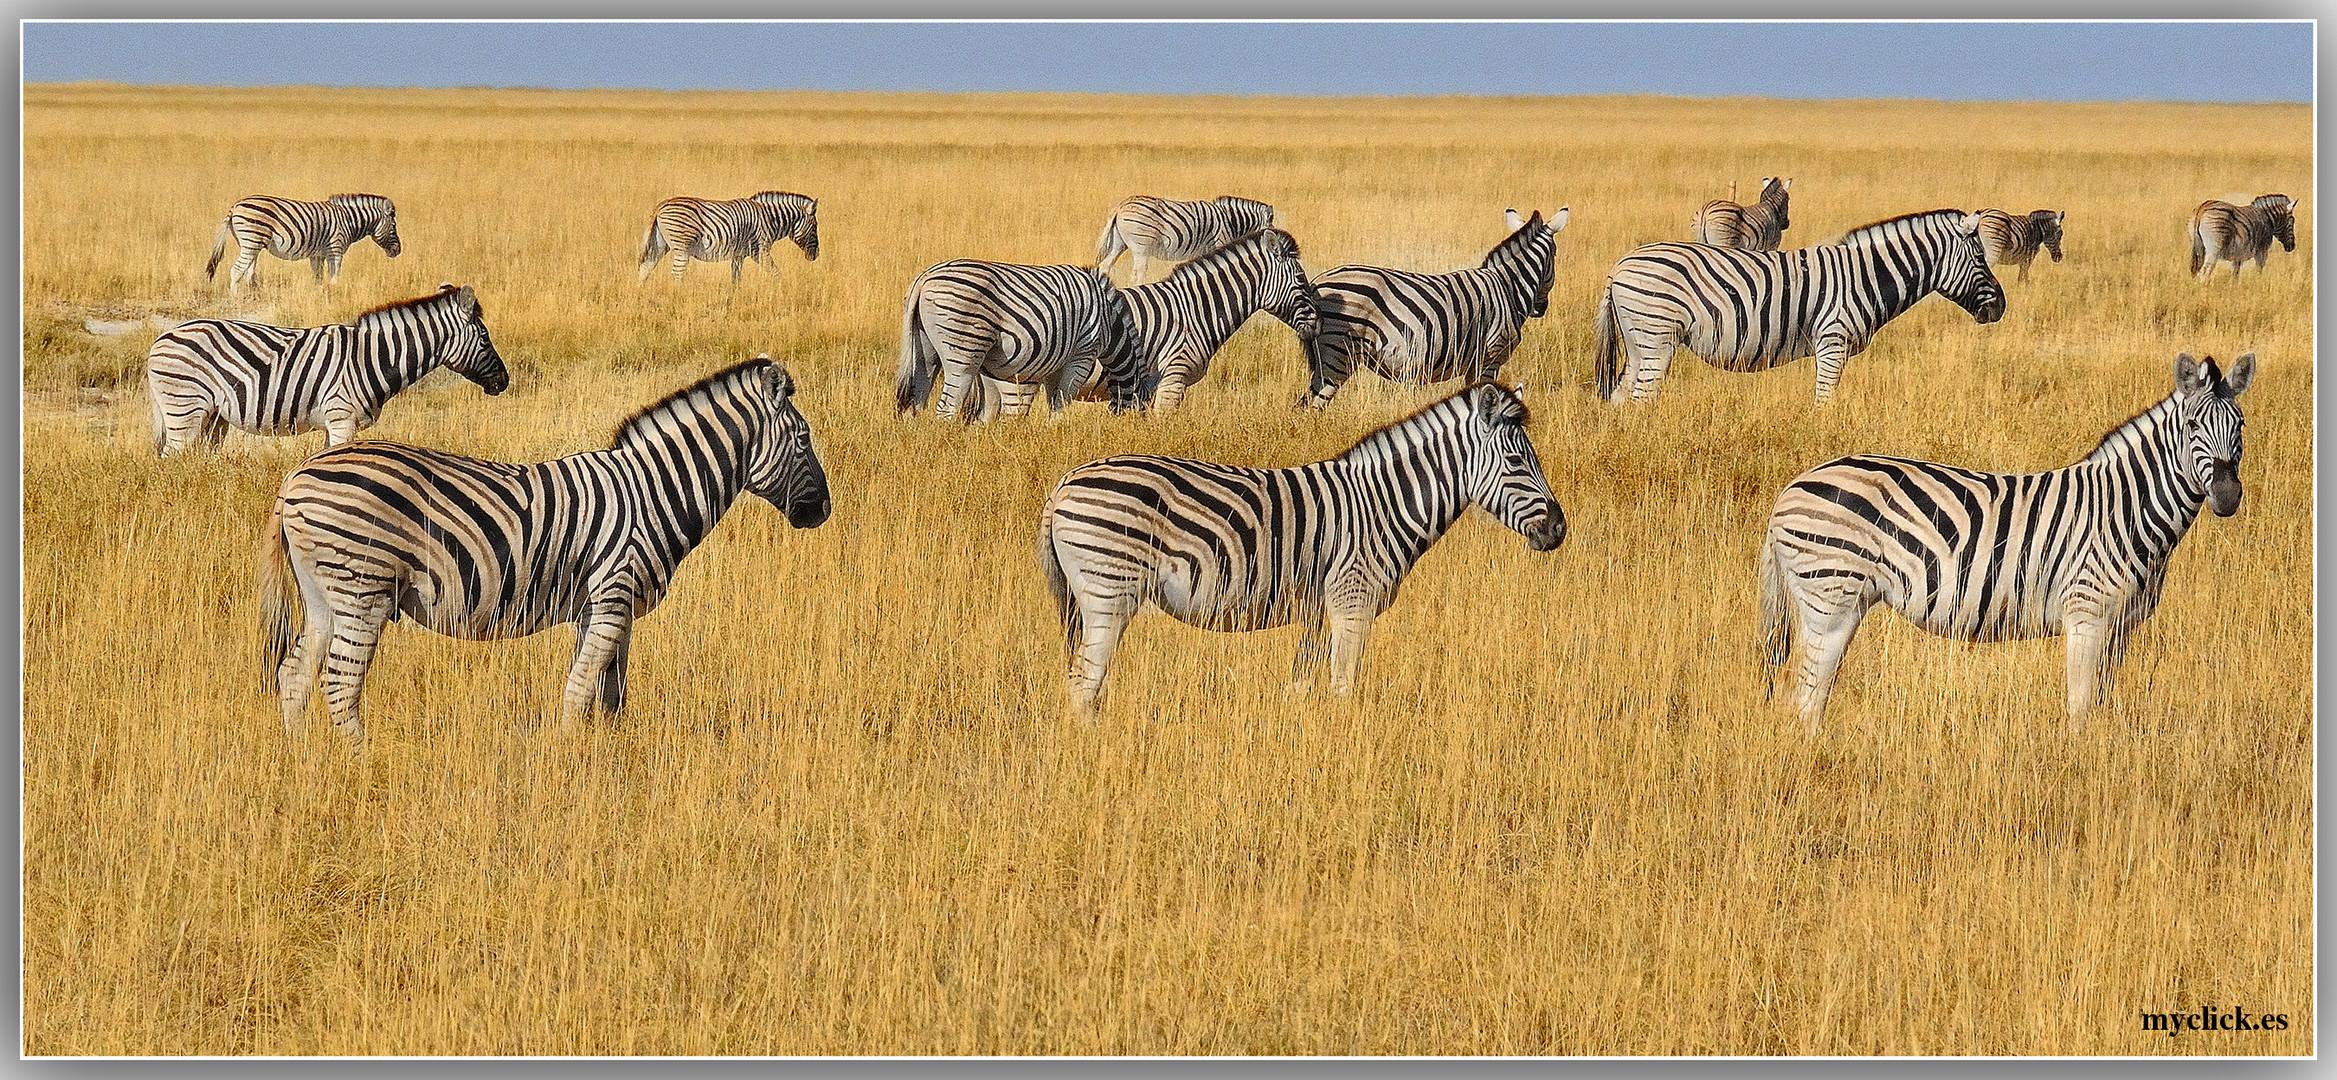 MEMORIAS DE AFRICA -CEBRAS EN LA SABANA -PN ETOSHA-NAMIBIA